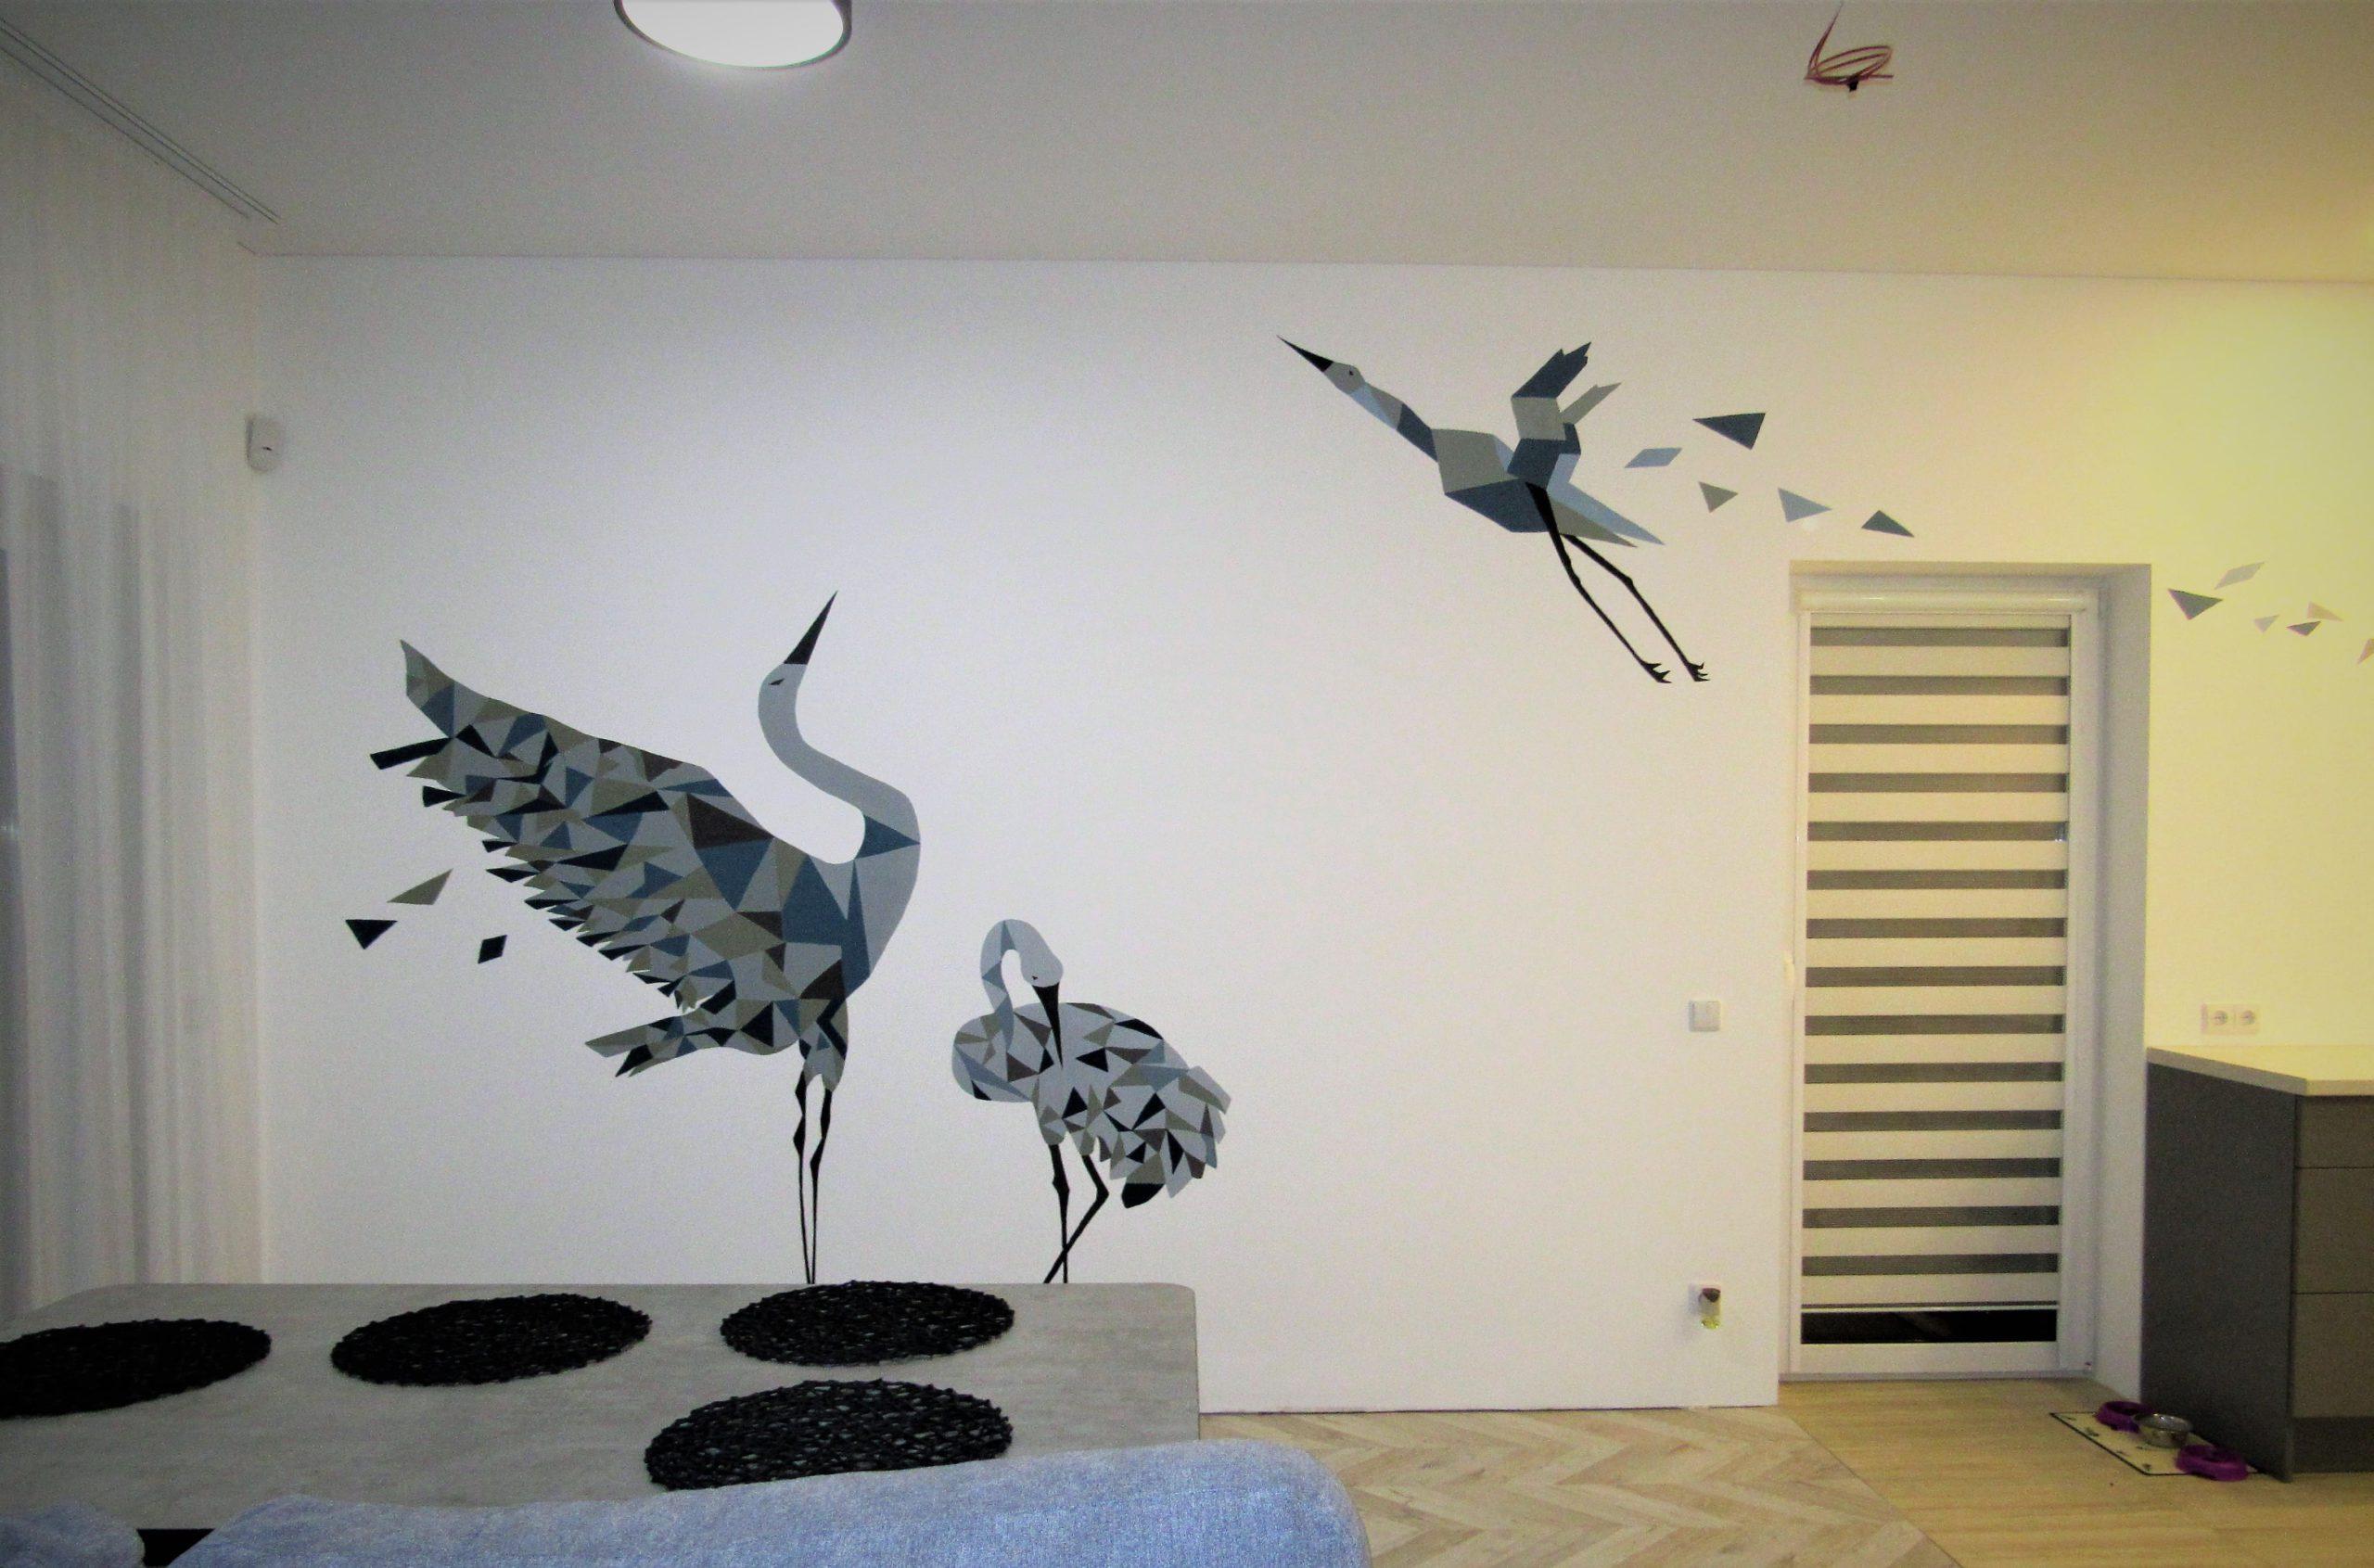 menine-kuryba-sienu-dekoravimas-ivairus-interjerai (2)